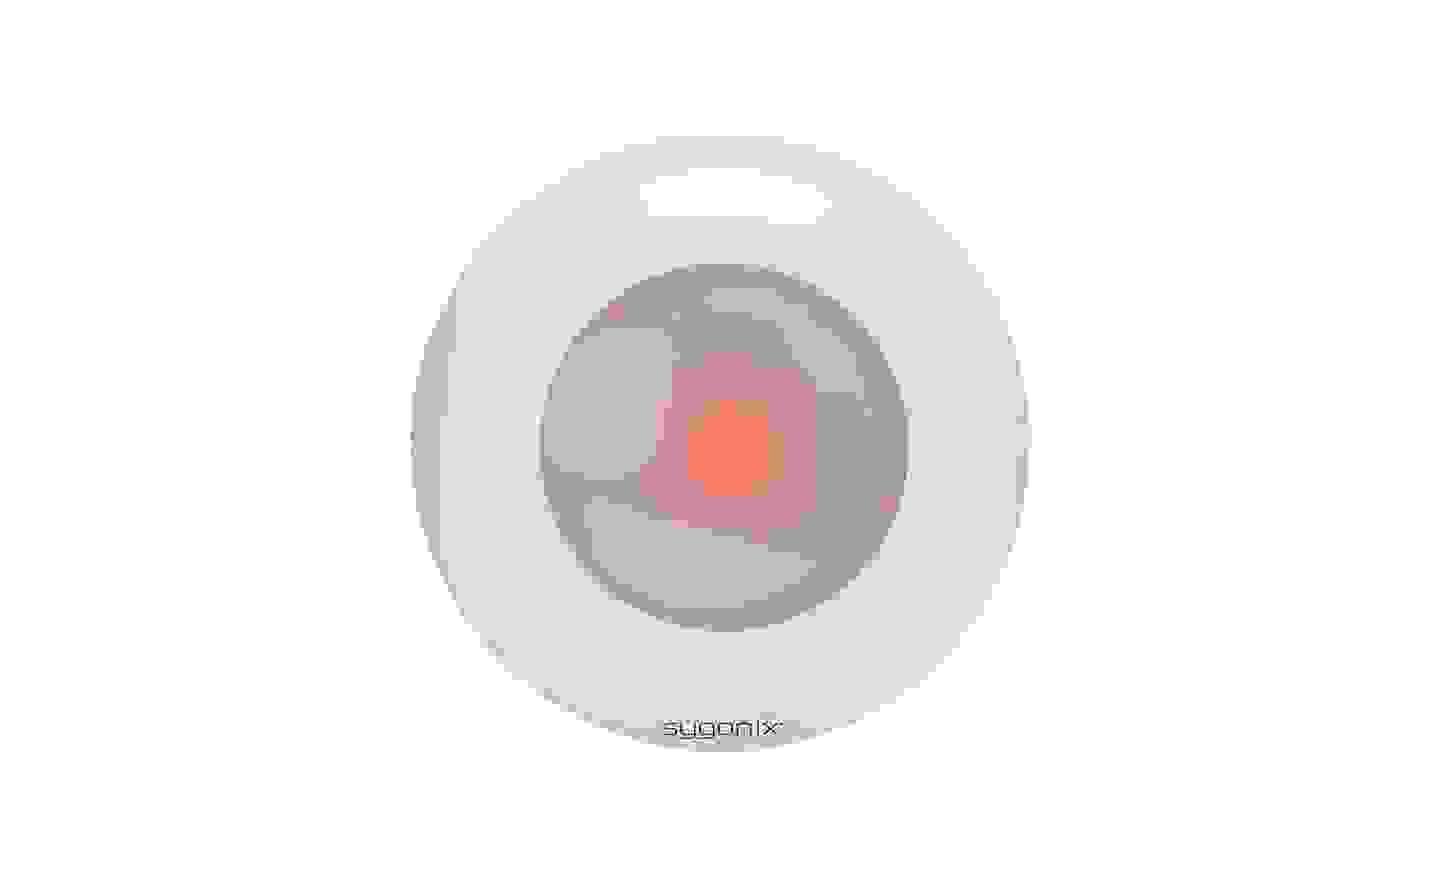 Sygonix - Alarmtechnik